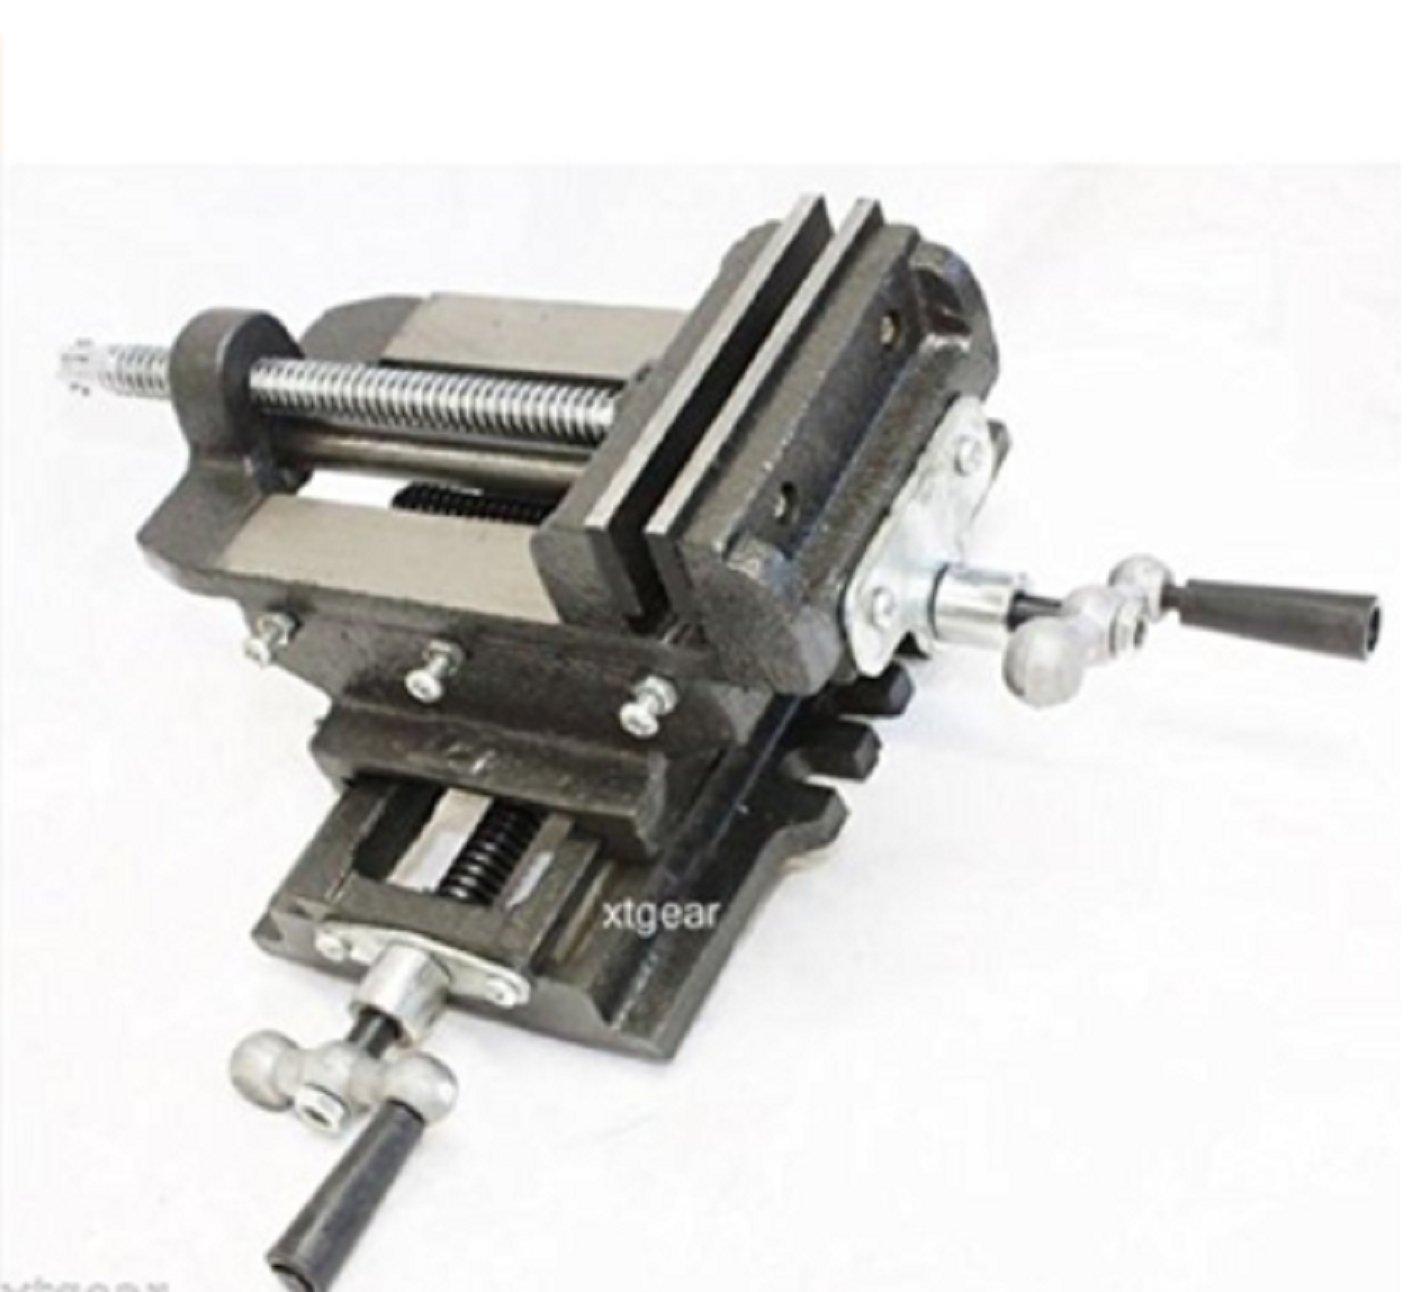 USA Premium Store 4'' Cross Drill Press Vise Slide Metal Milling 2 Way X-Y Clamp Machine Heavy Duty by USA Premium Store